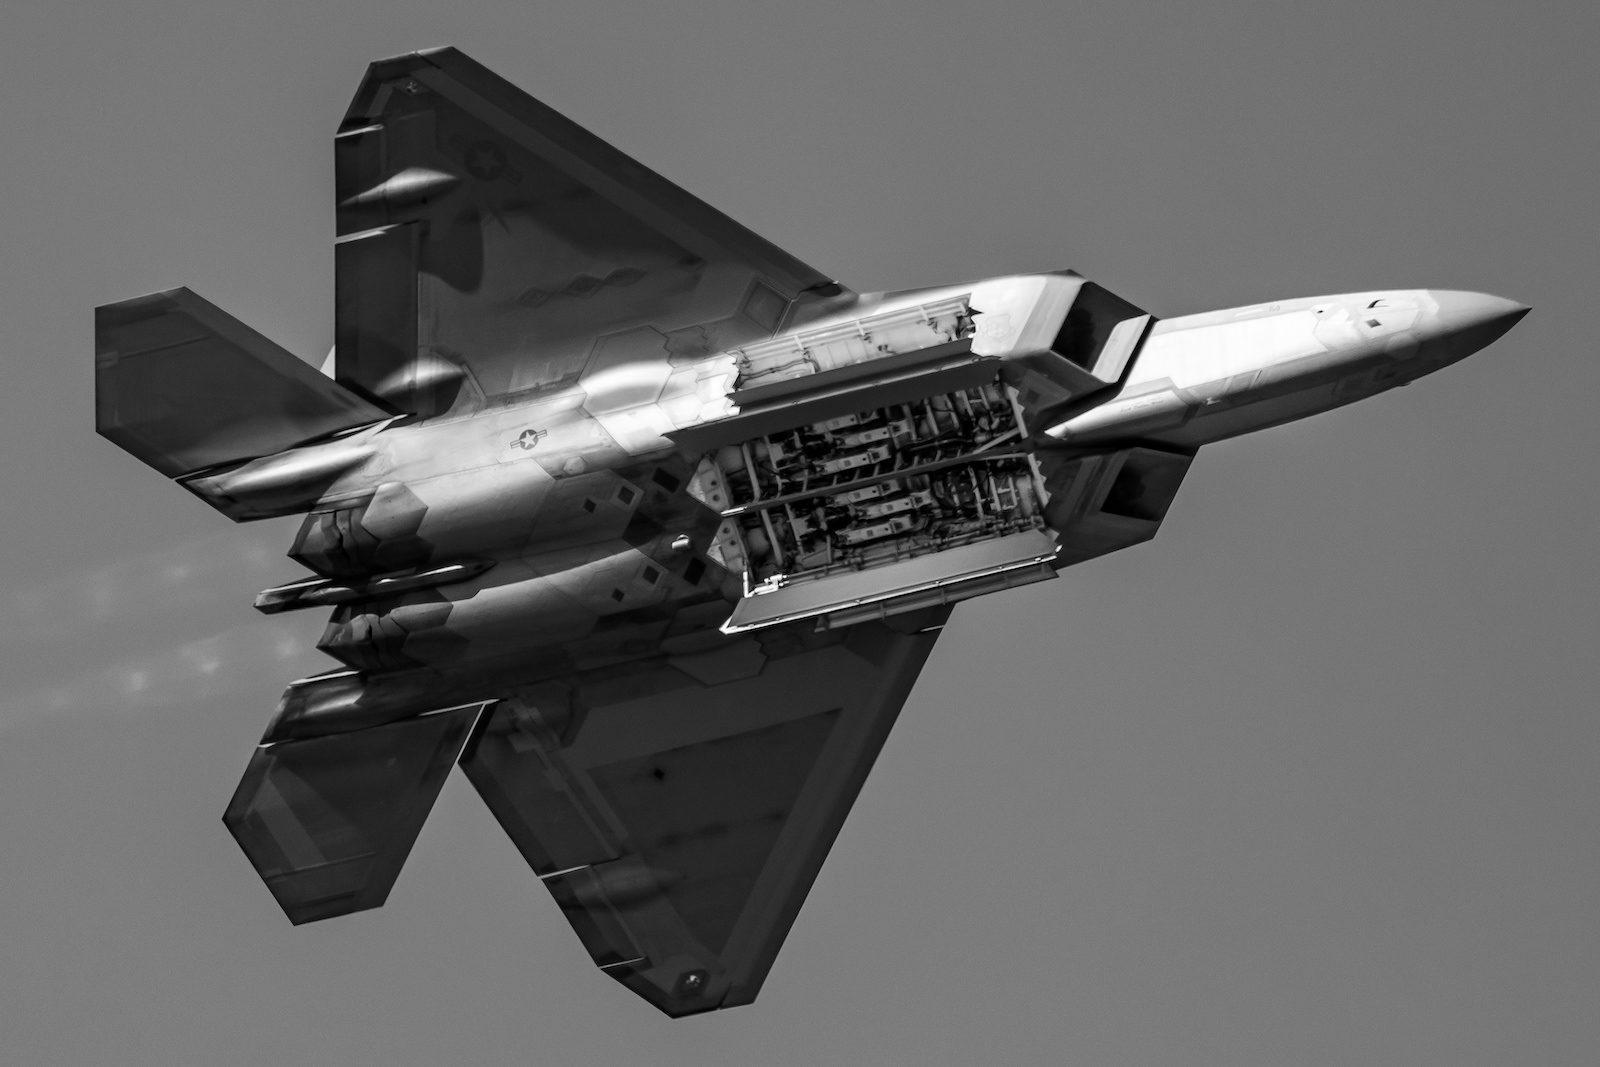 USAF F-22 Raptor at NAS Pensacola